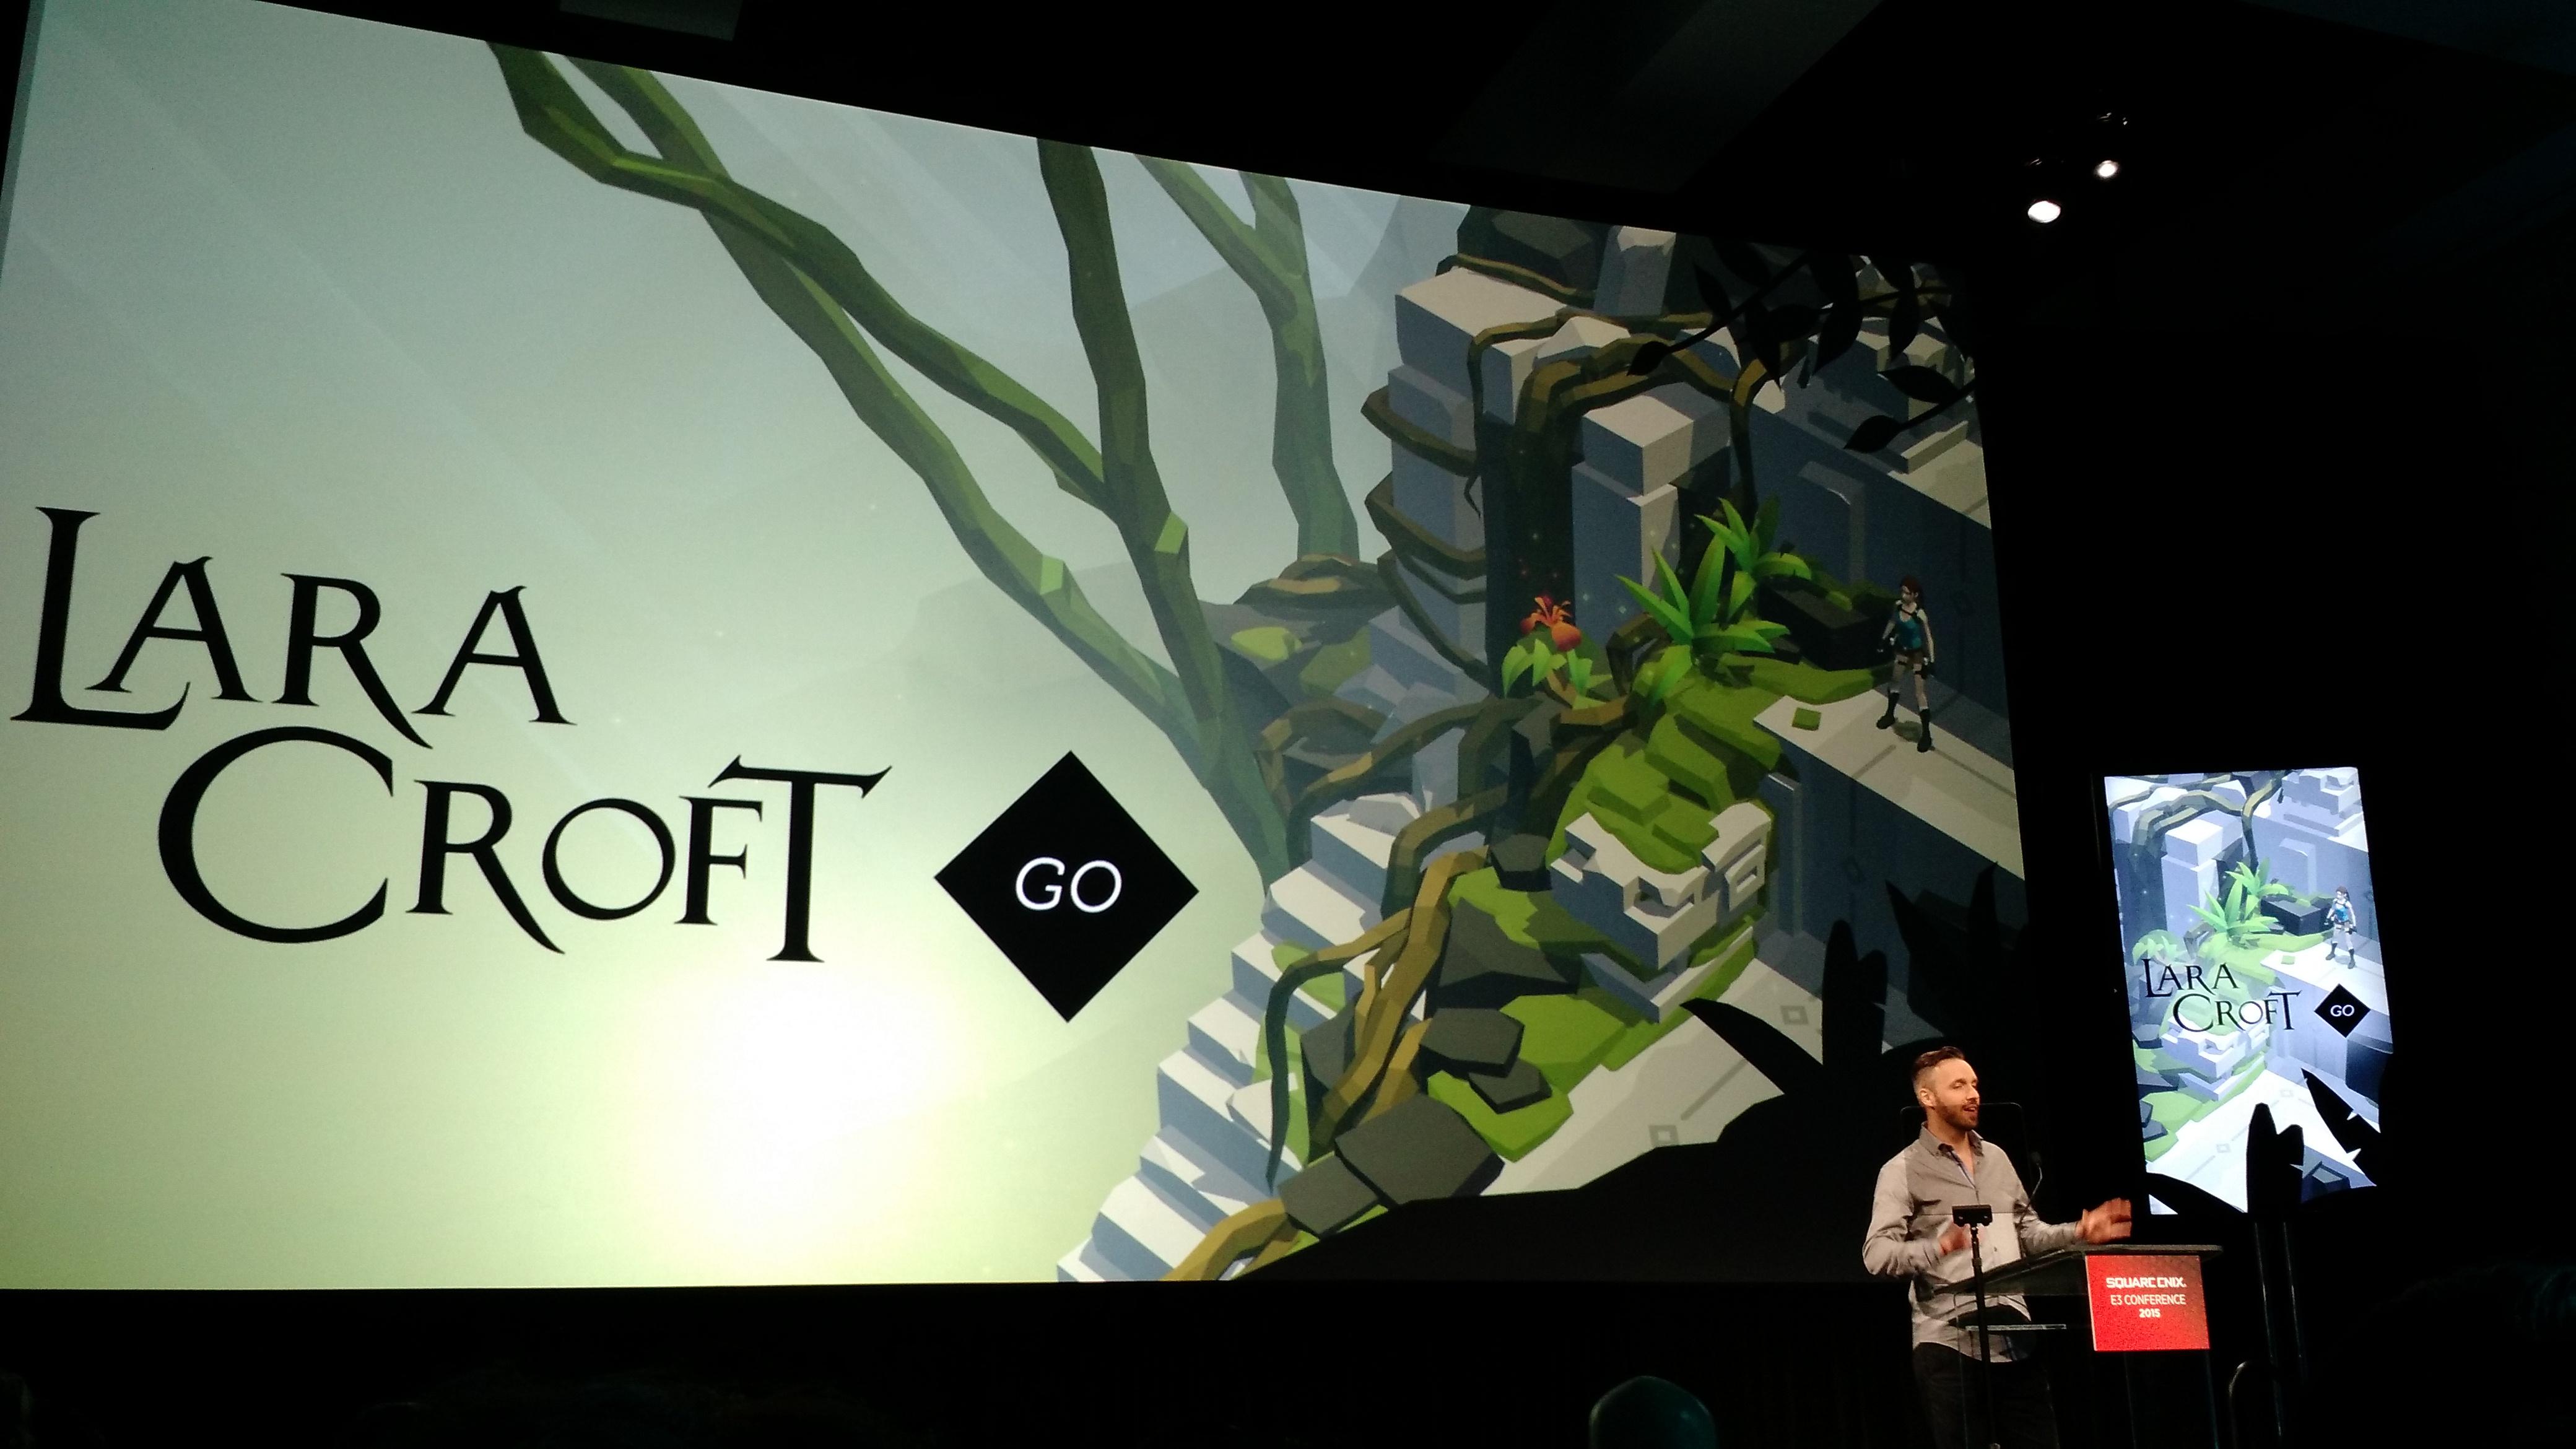 Lara Croft Go in download dal 27 Agosto